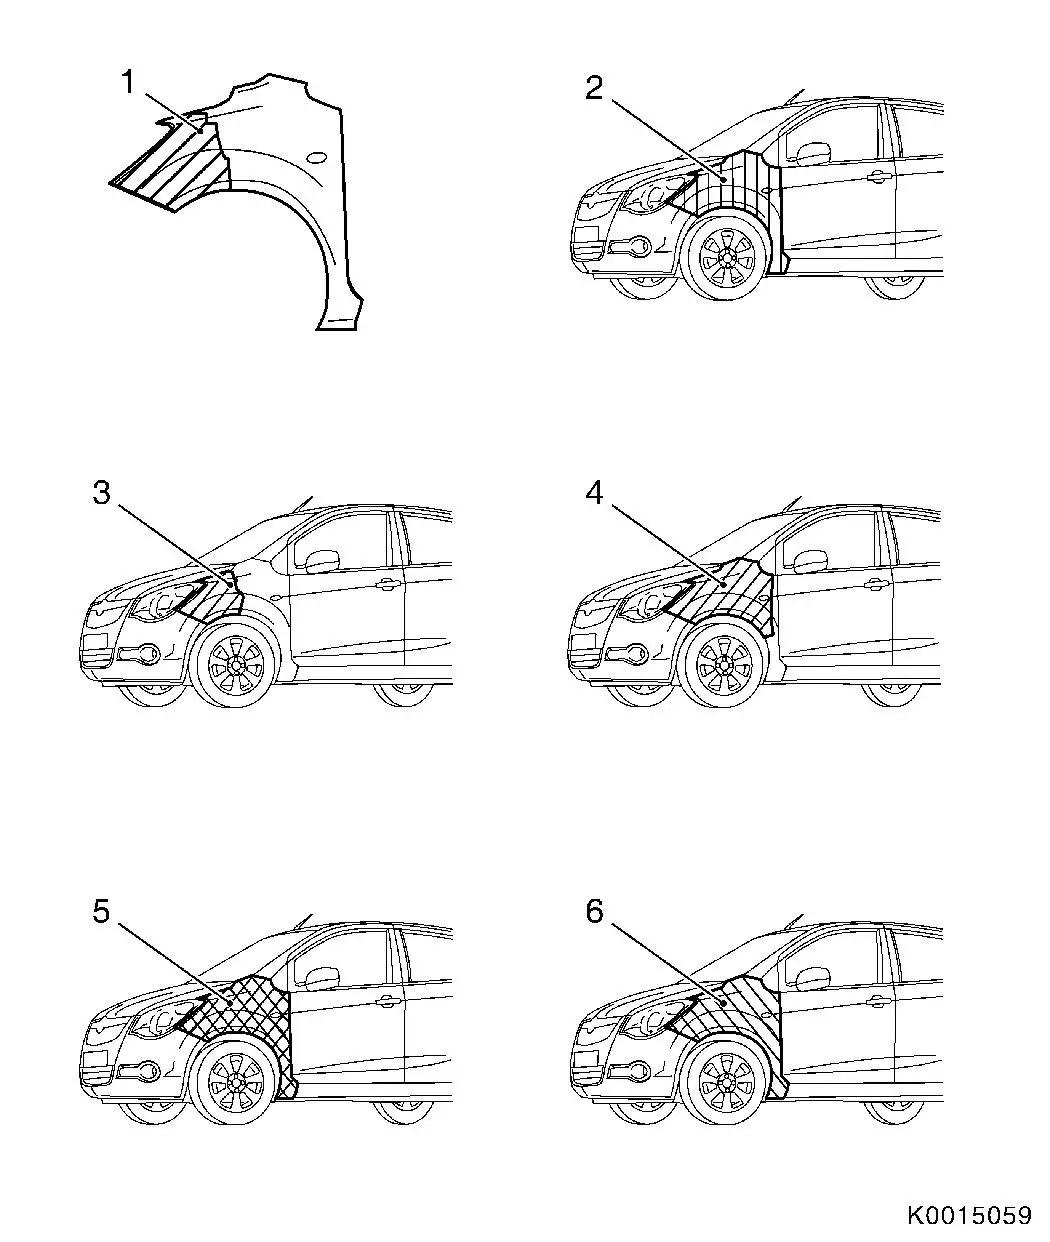 Vauxhall Workshop Manuals > Corsa B > B Paint > Painting